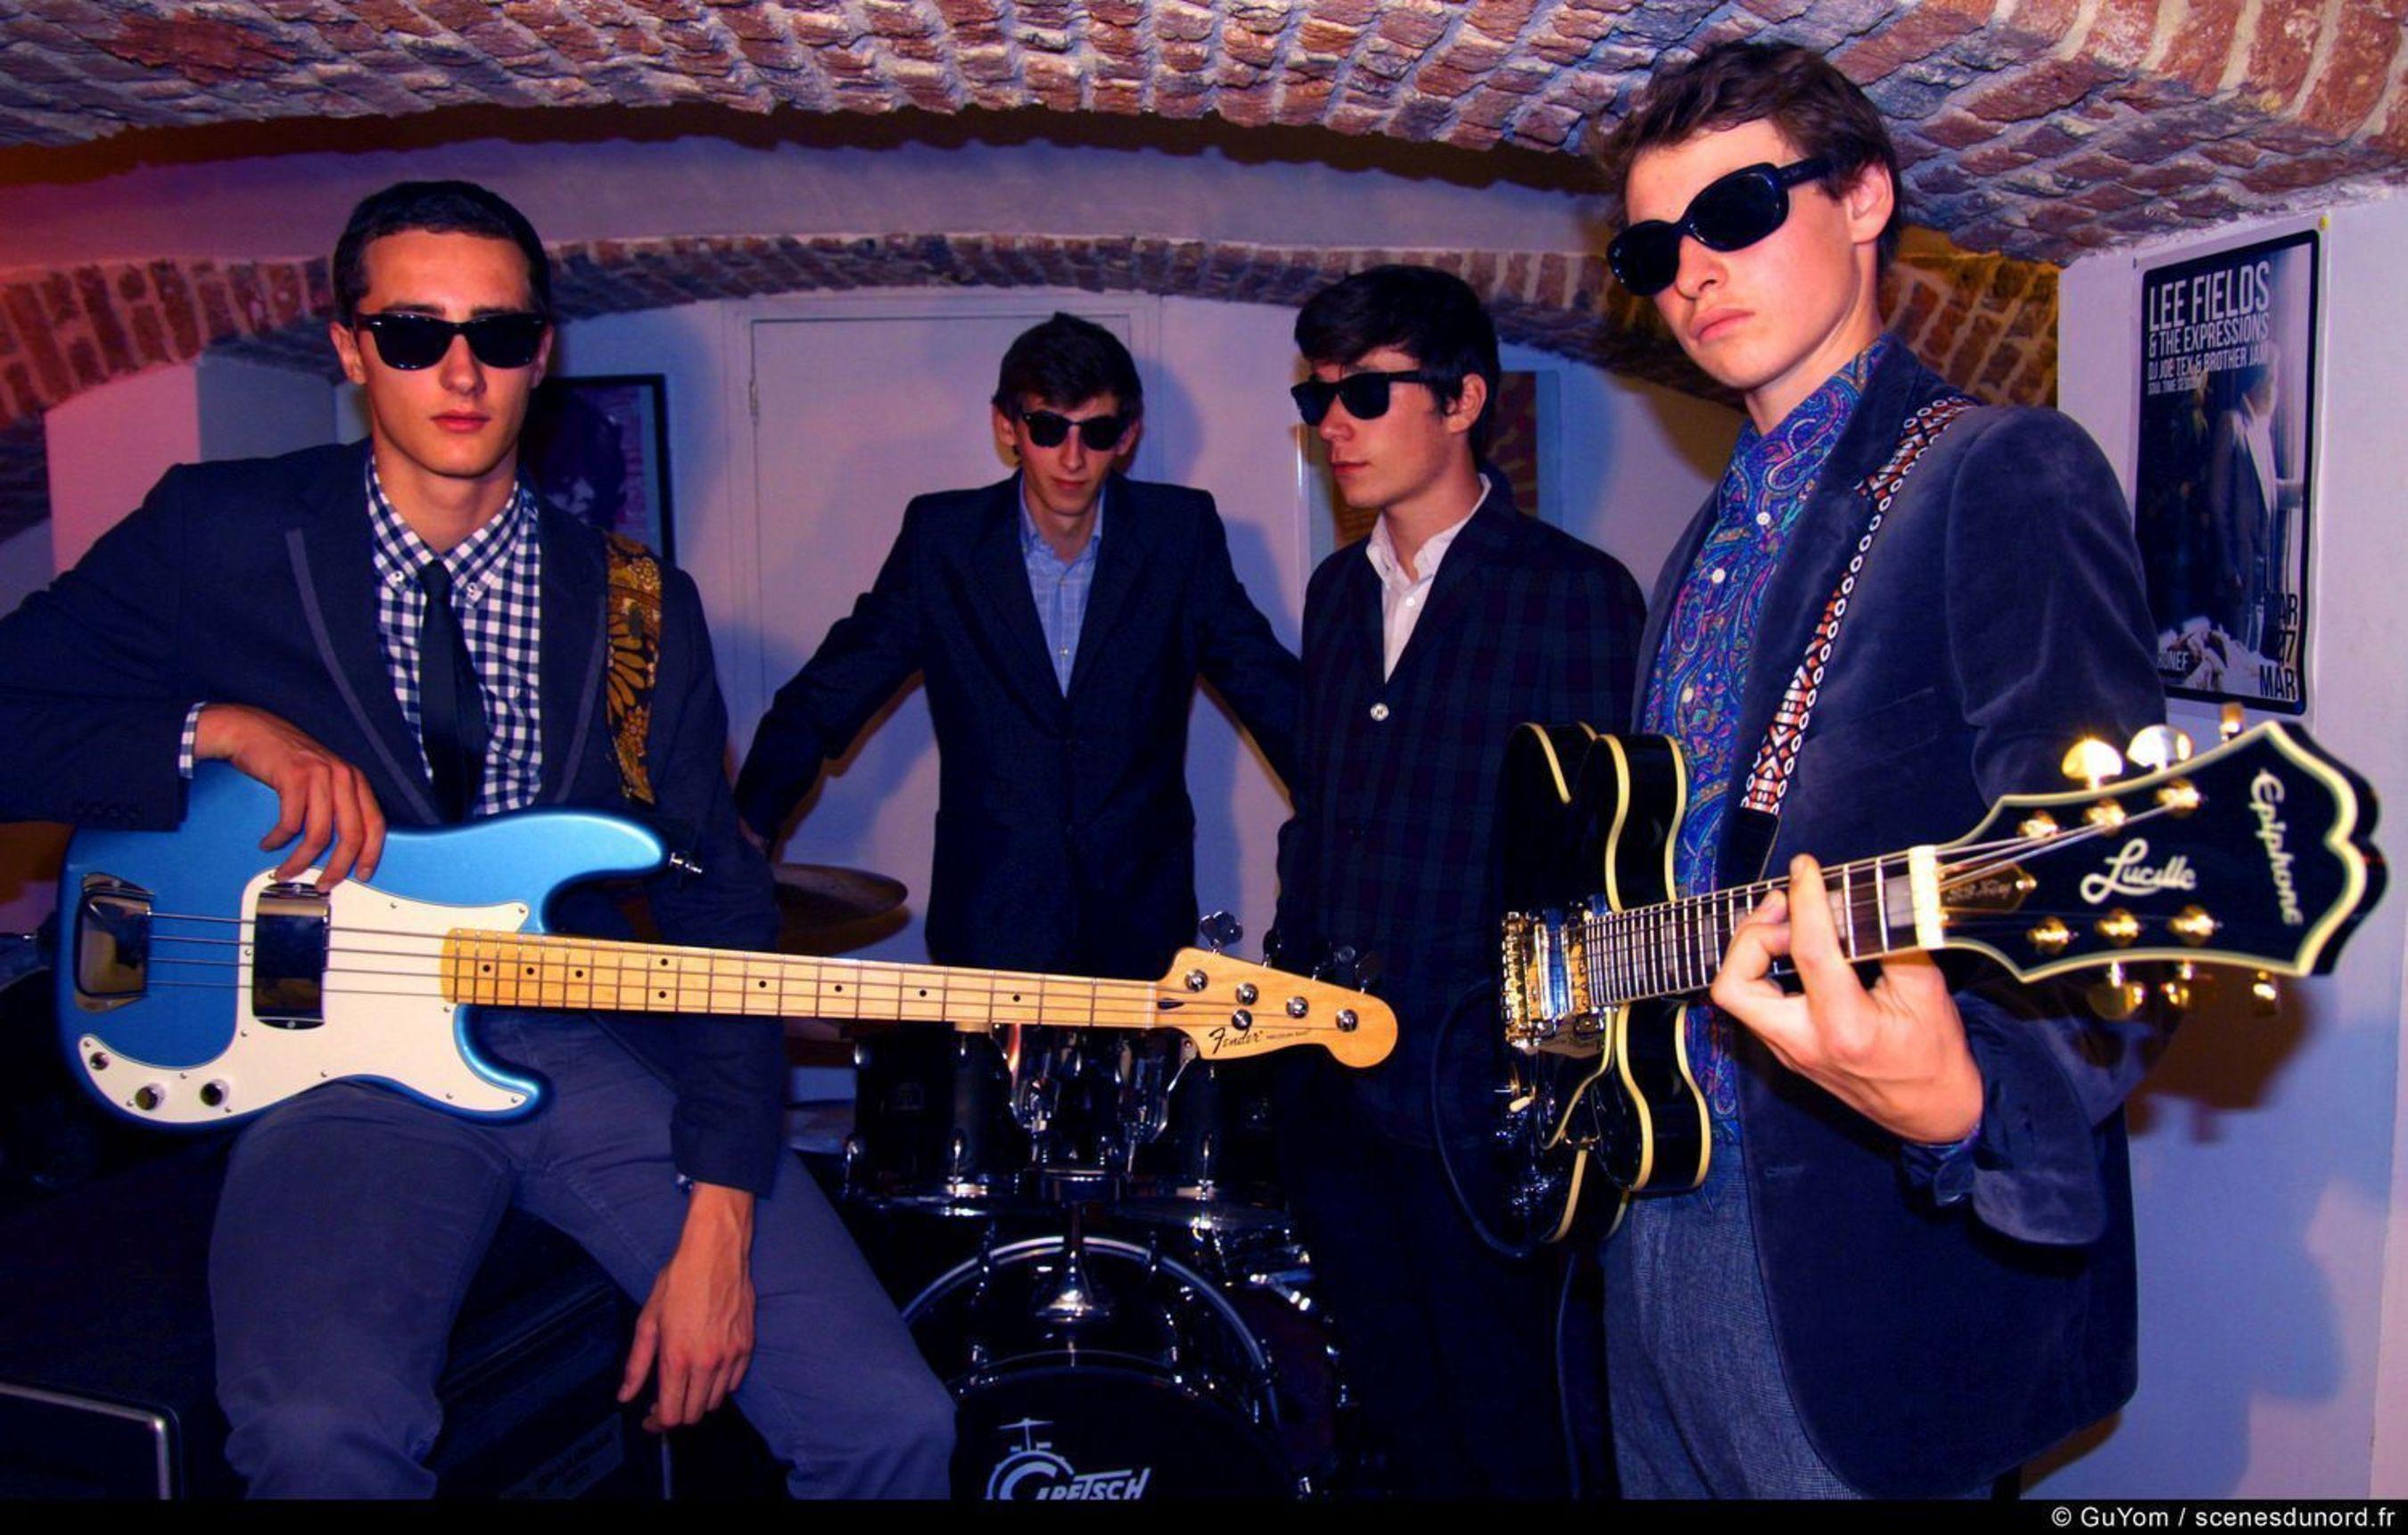 The Arrogants (L-R): Louis Szymanowski, Hugo El Hadeuf, Martin Tournemire, Thomas Babczynski (PRNewsFoto/Dirty Water Records)